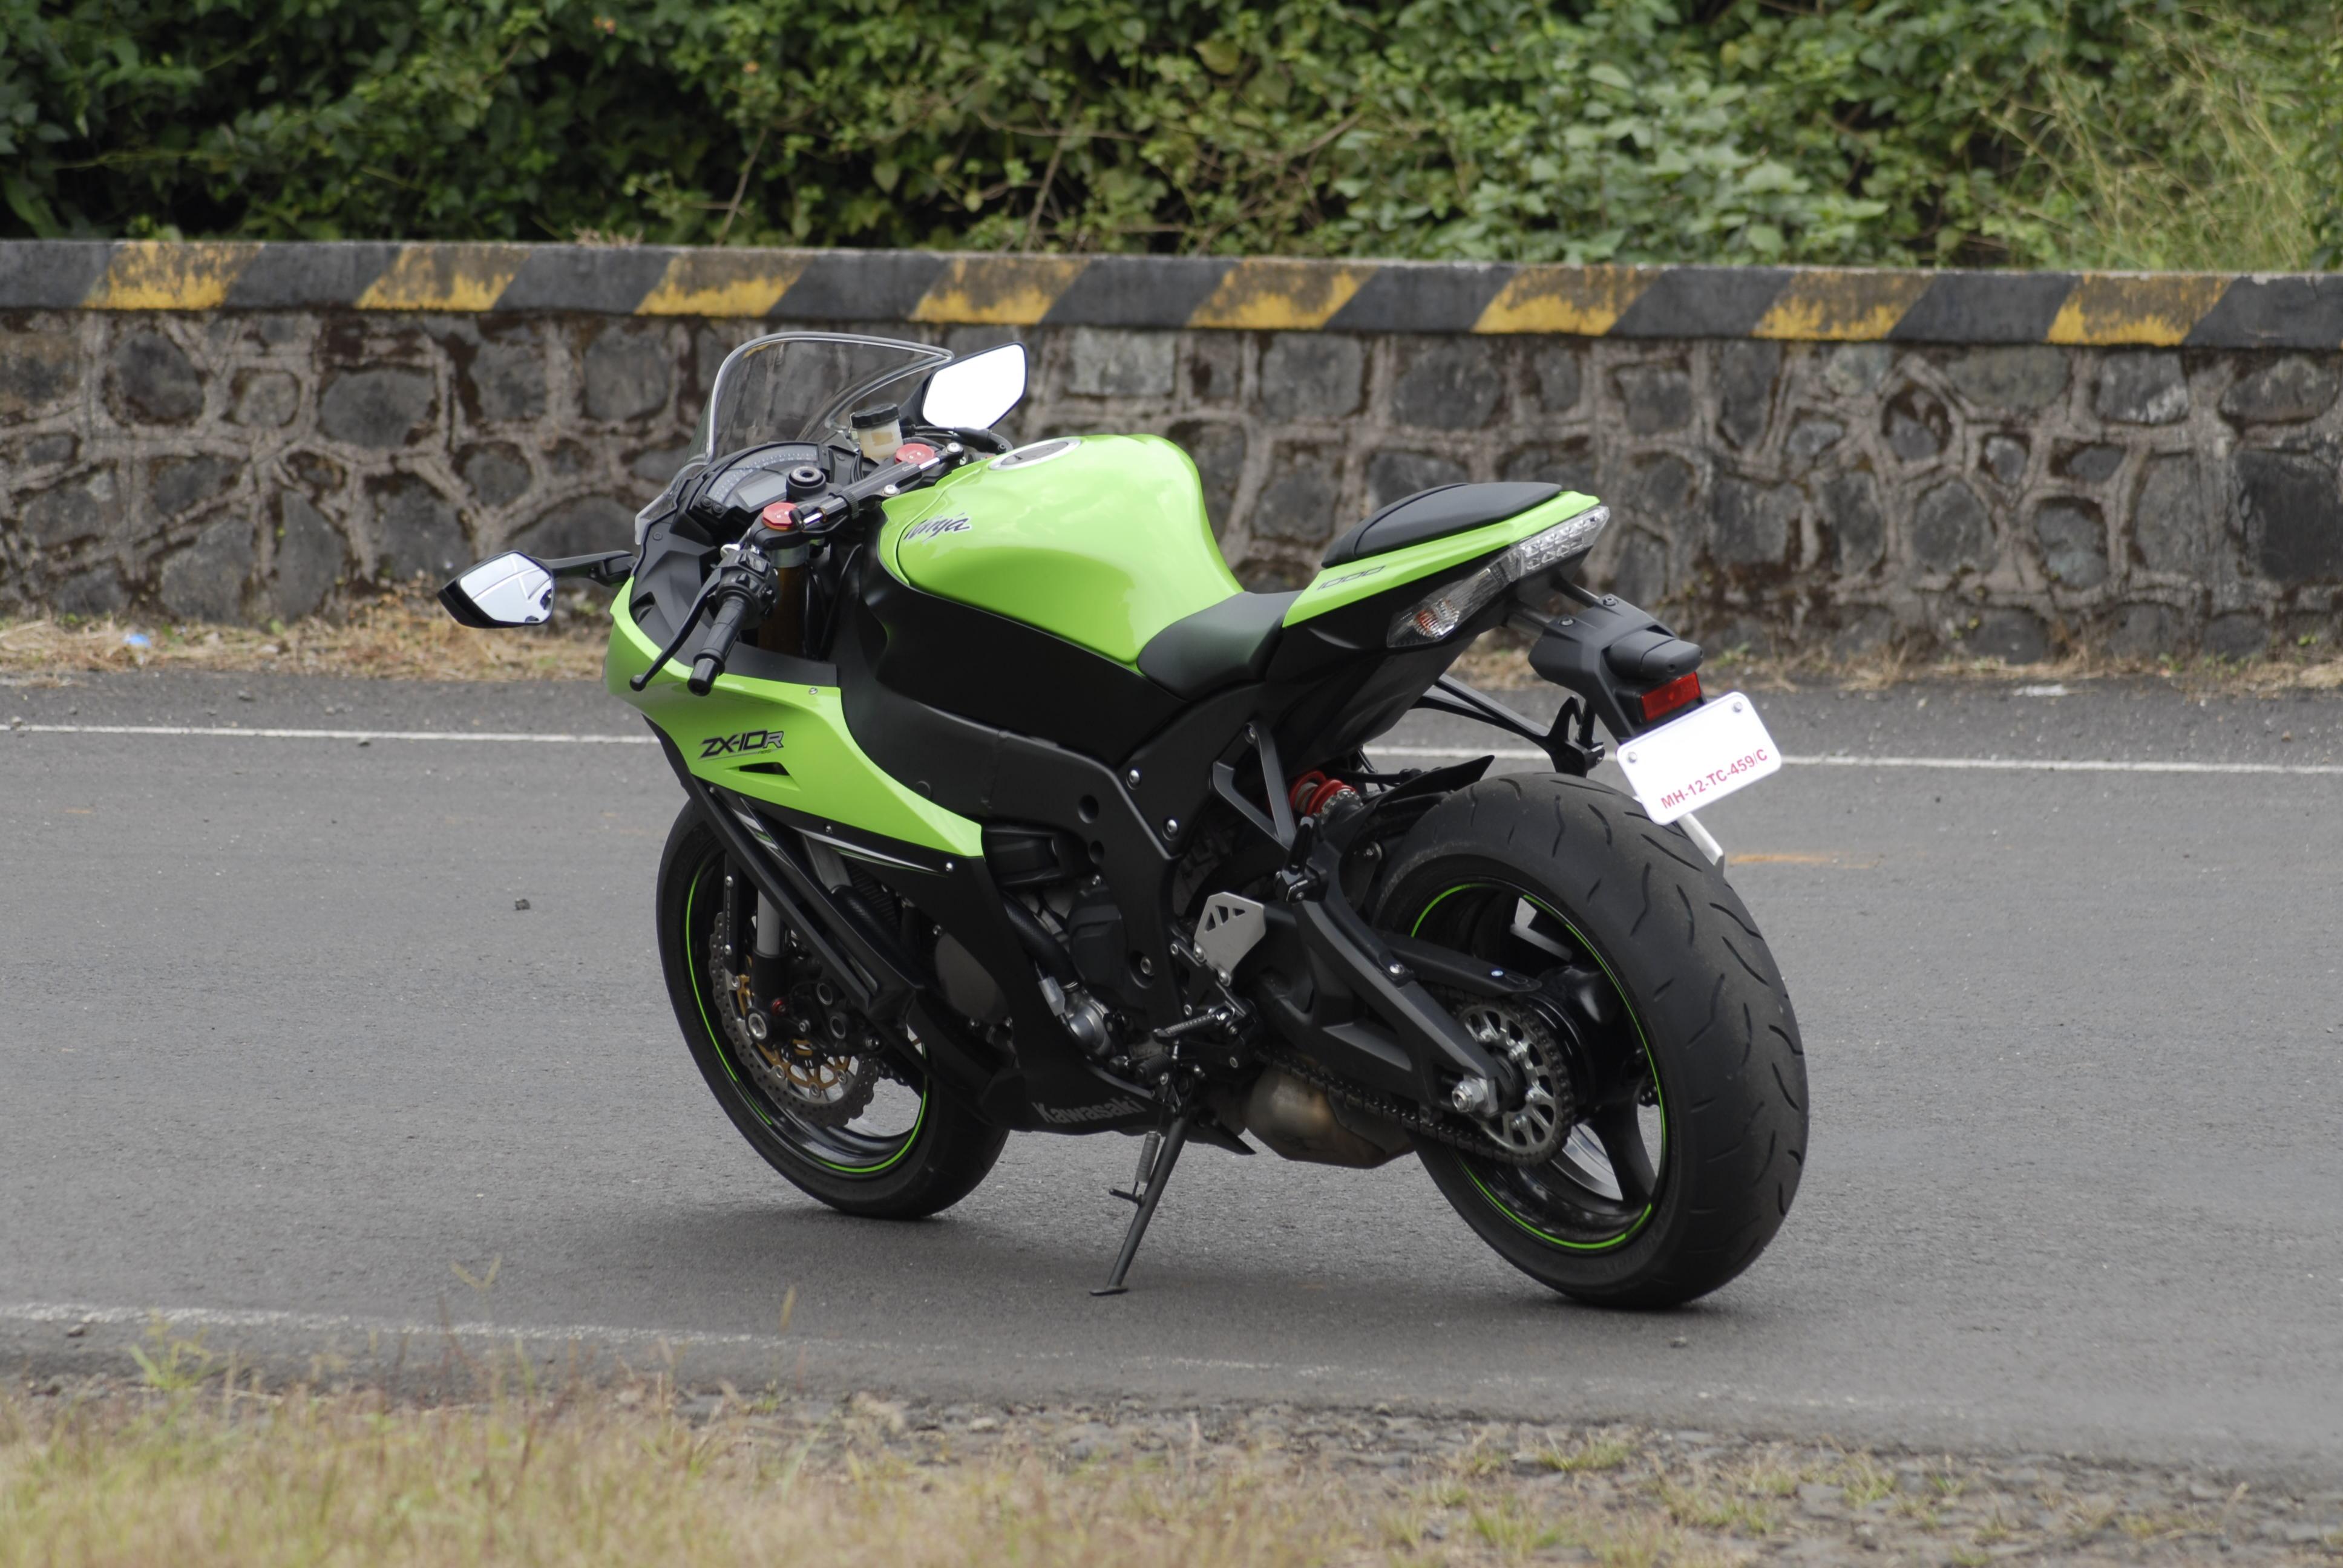 Street Motorcycle Kawasaki Ninja 800cc Price